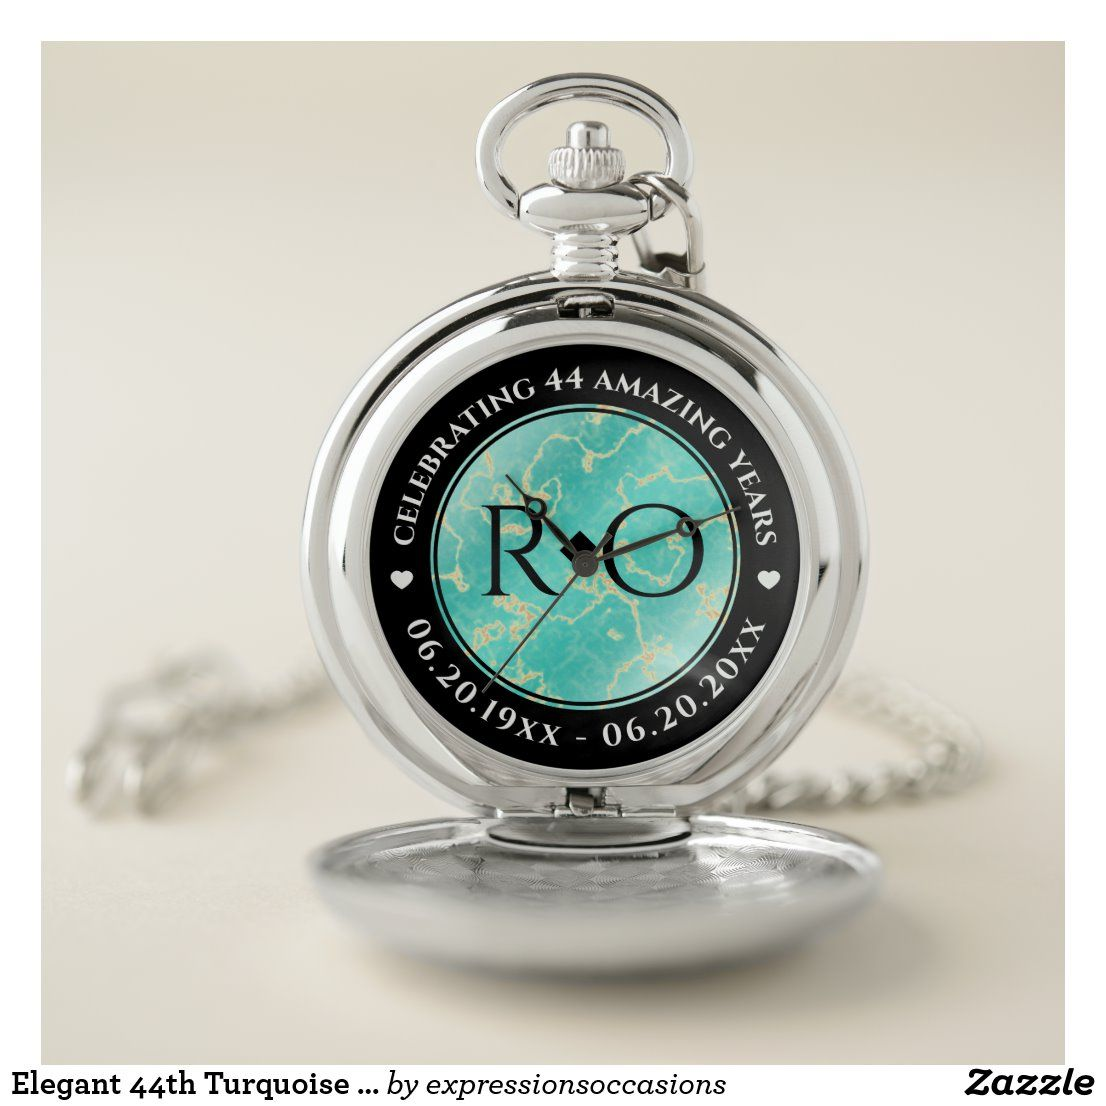 Elegant 11th 44th Turquoise Wedding Anniversary Pocket